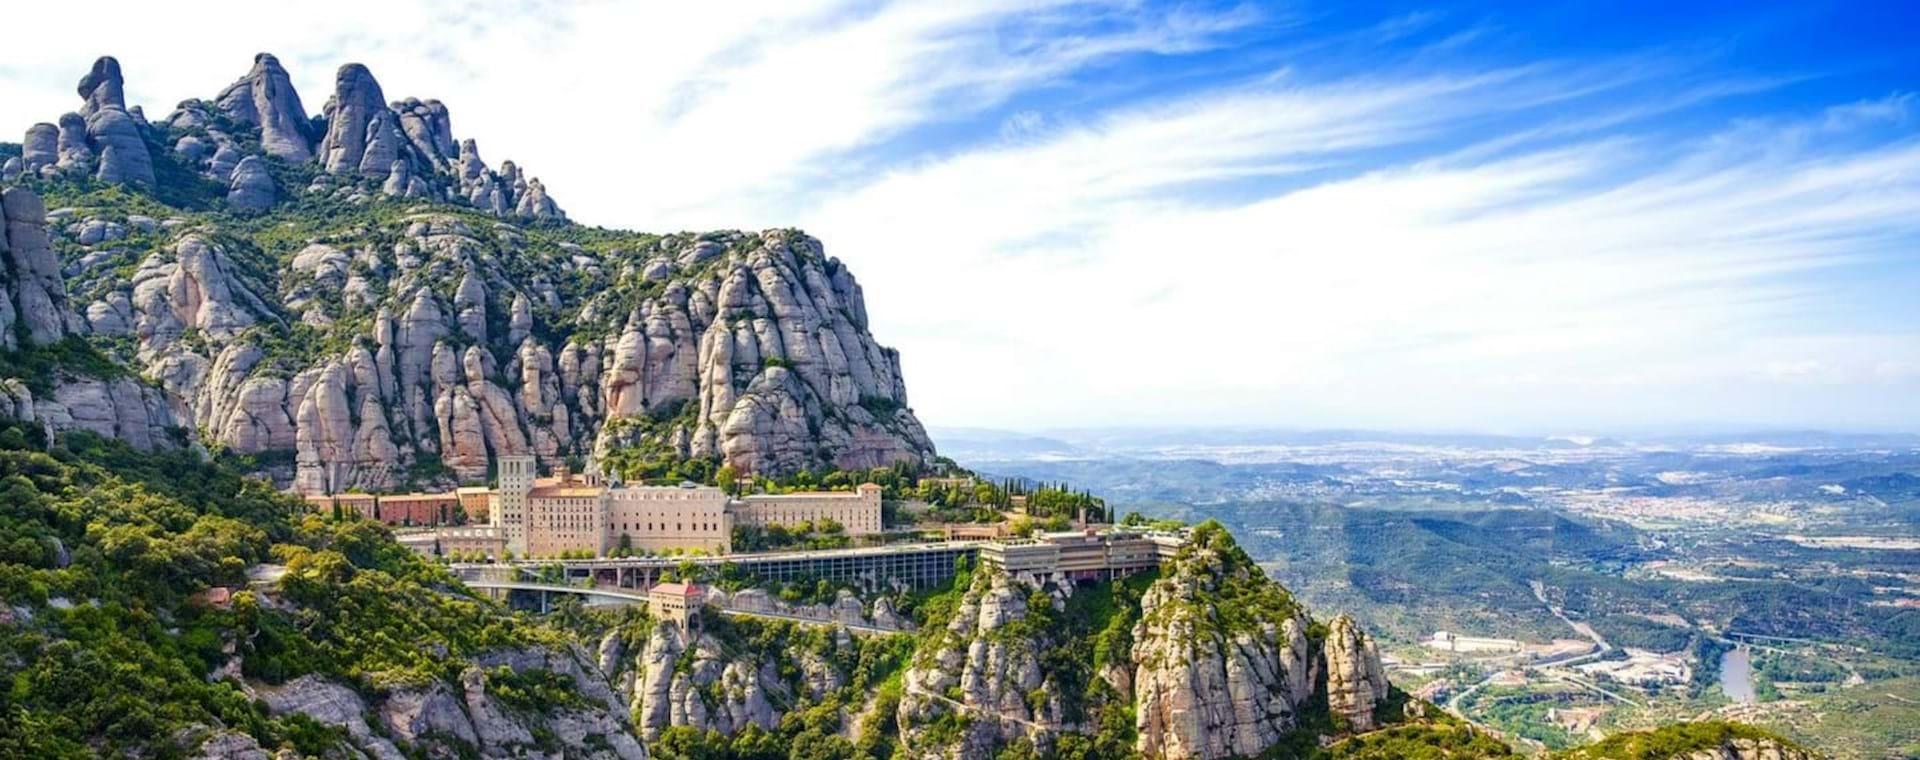 Early-Morning Express: Montserrat Tour